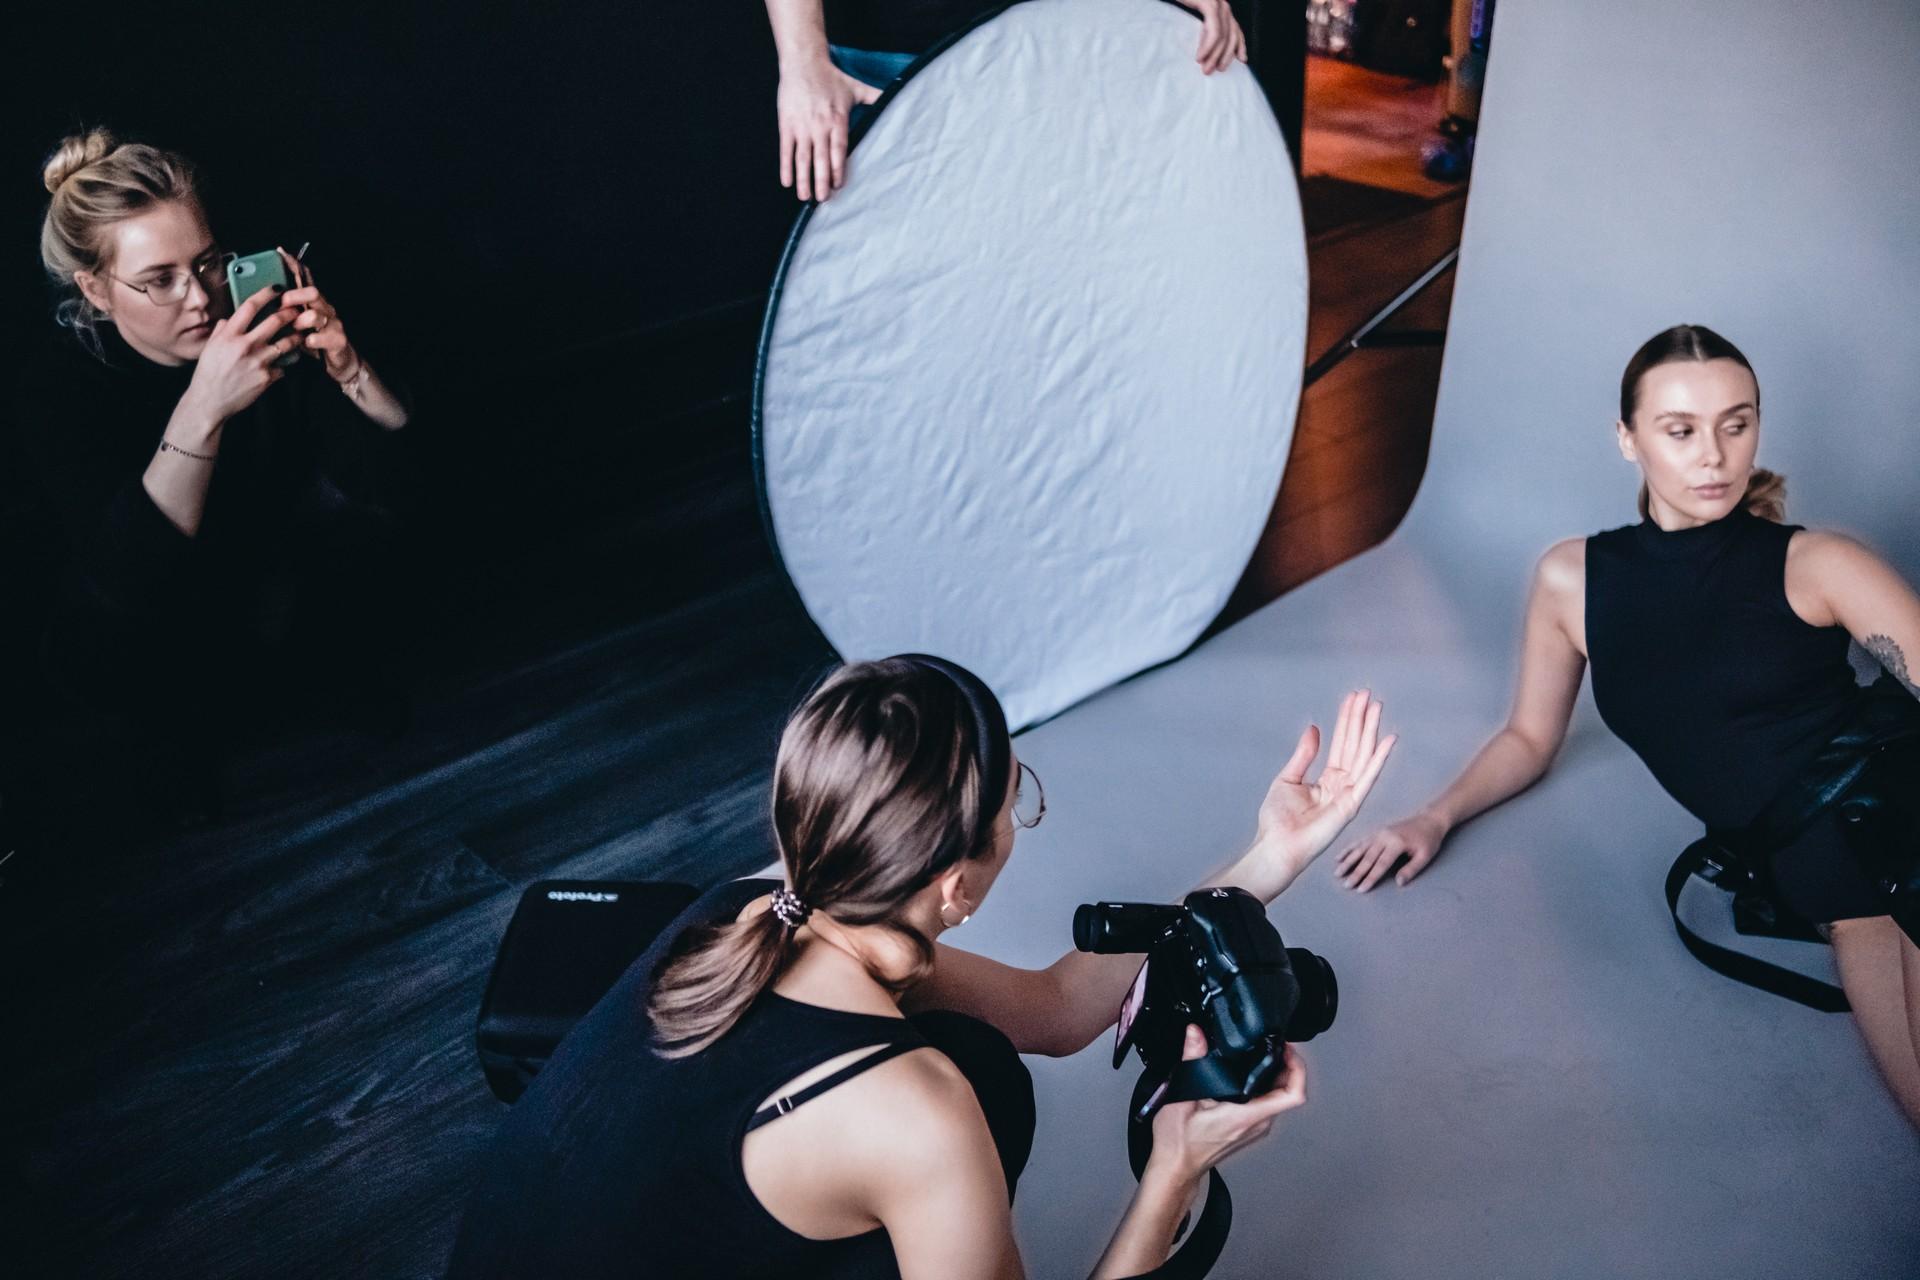 Backstage - Karolina Fafińska Malva Models Dominika Ratajczak Studio Onegog fot. Jarosław Respondek